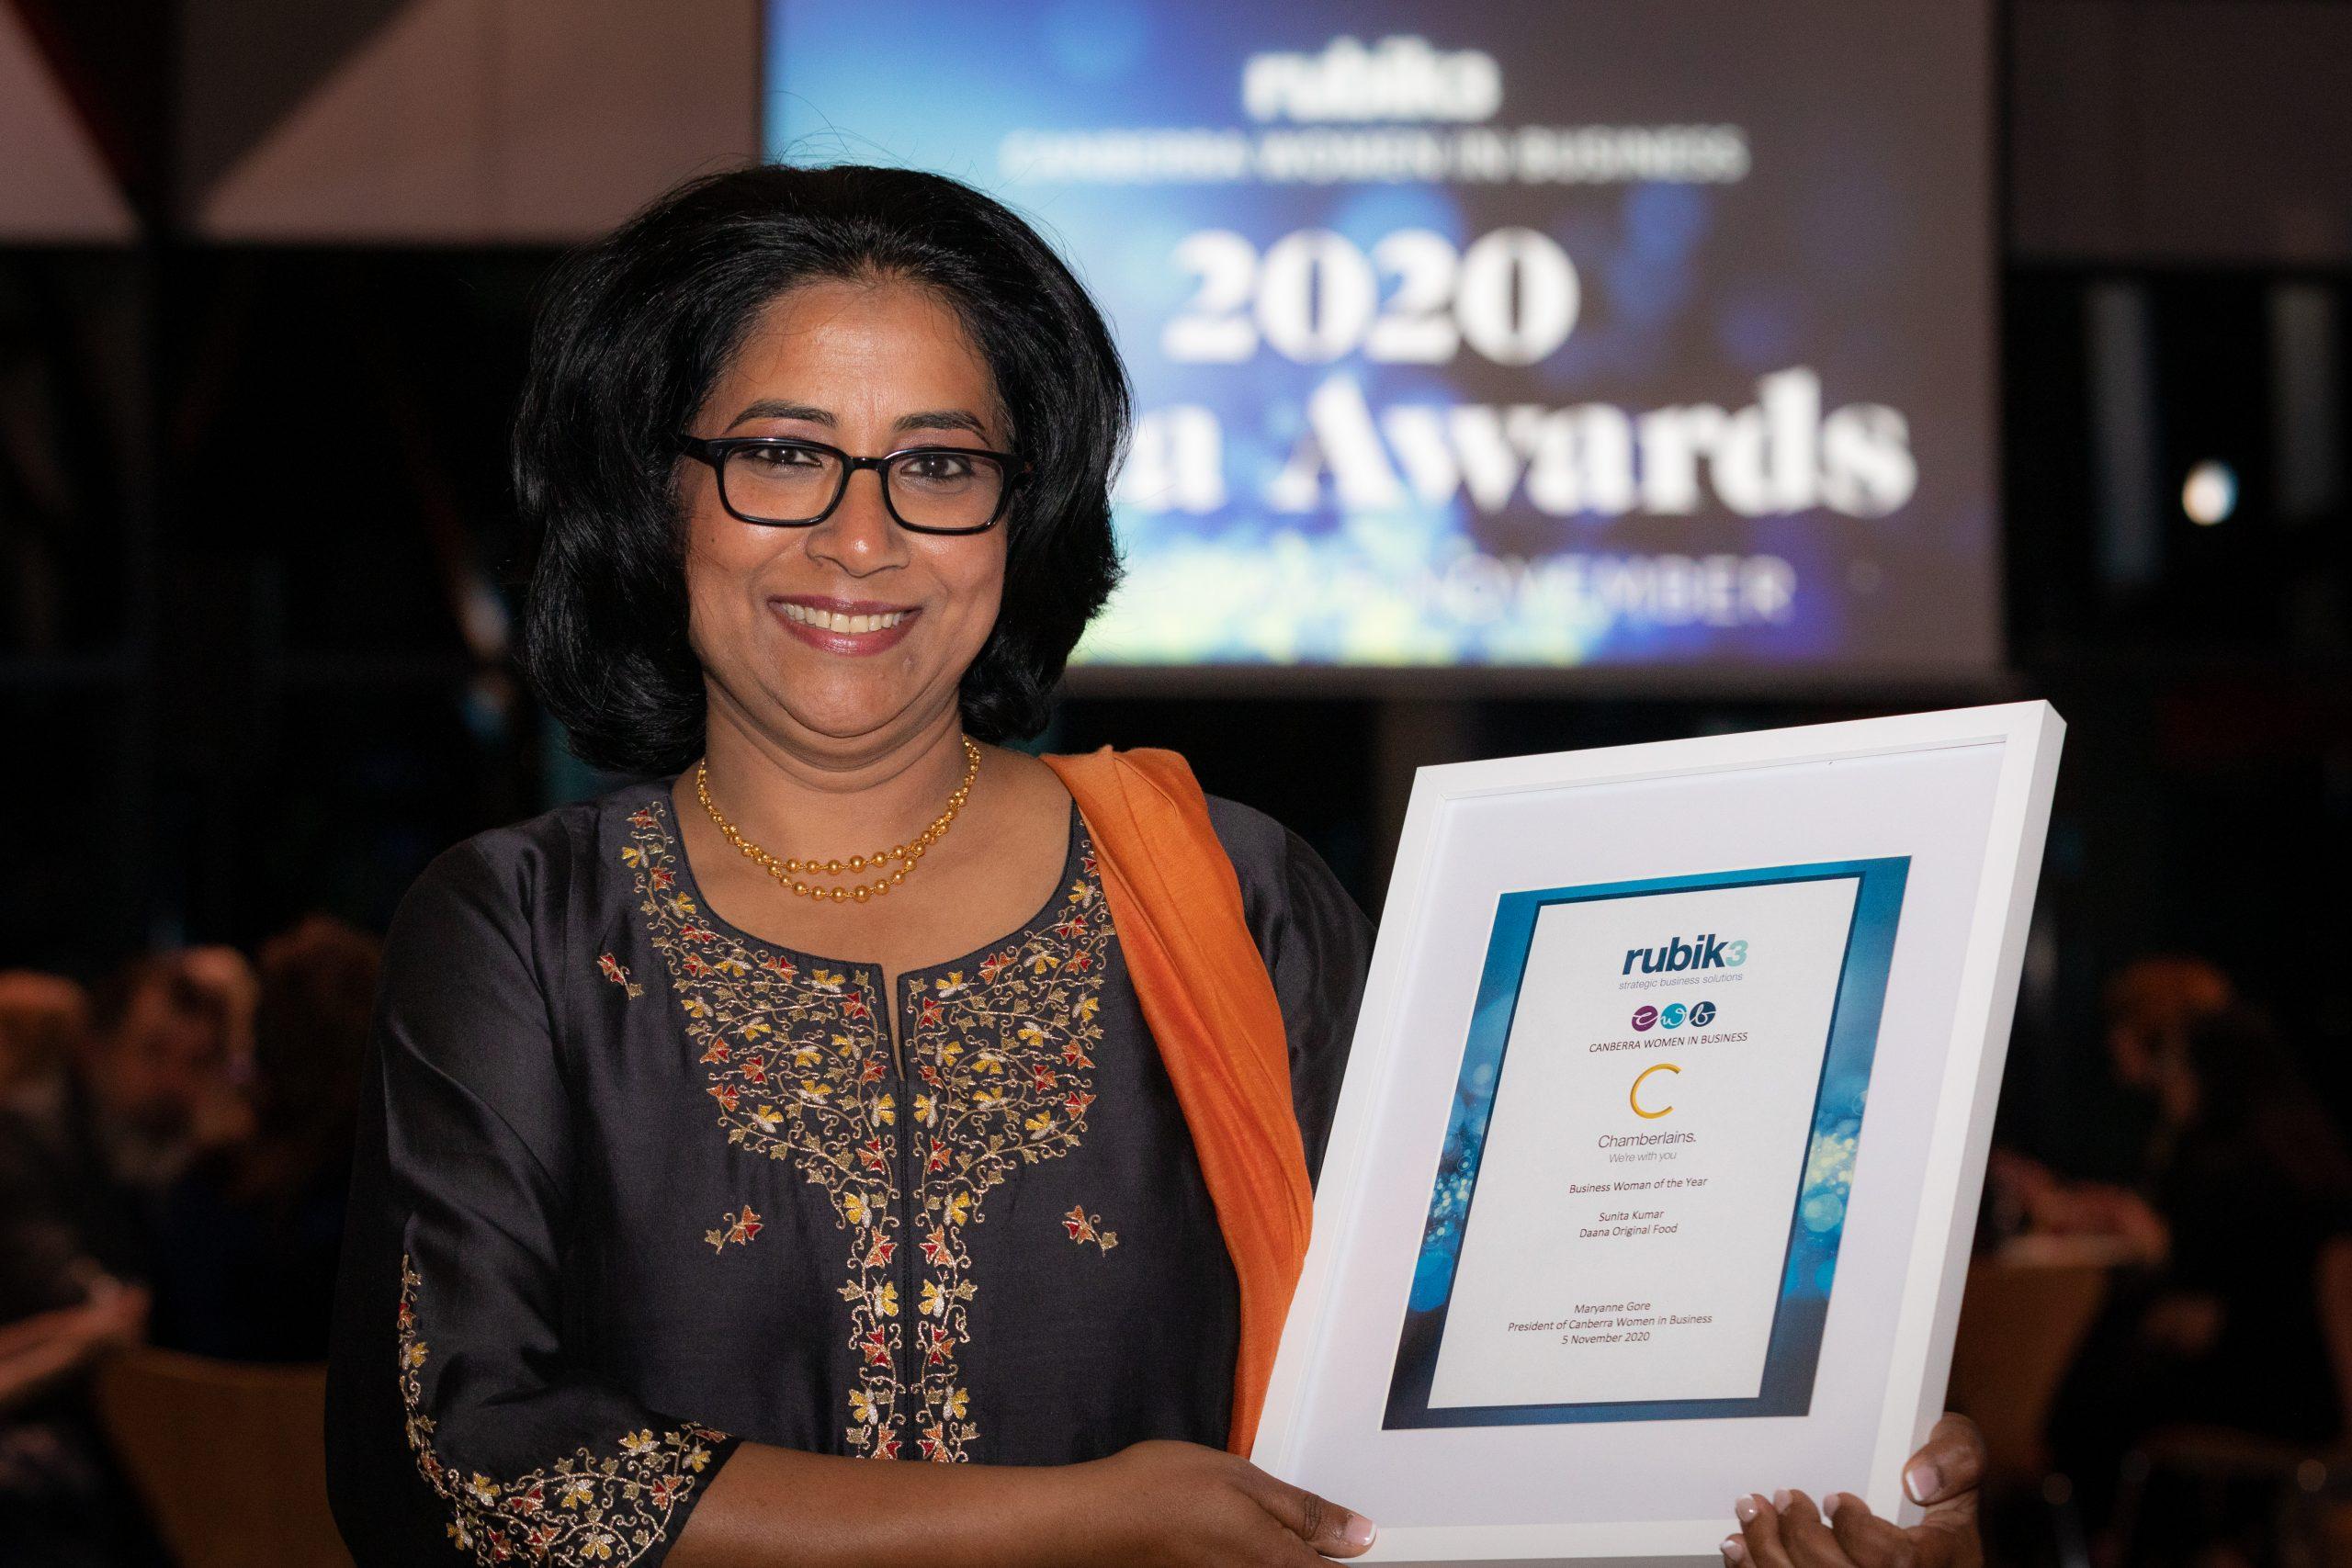 2020 Canberra Business Woman of the Year, Sunita Kumar